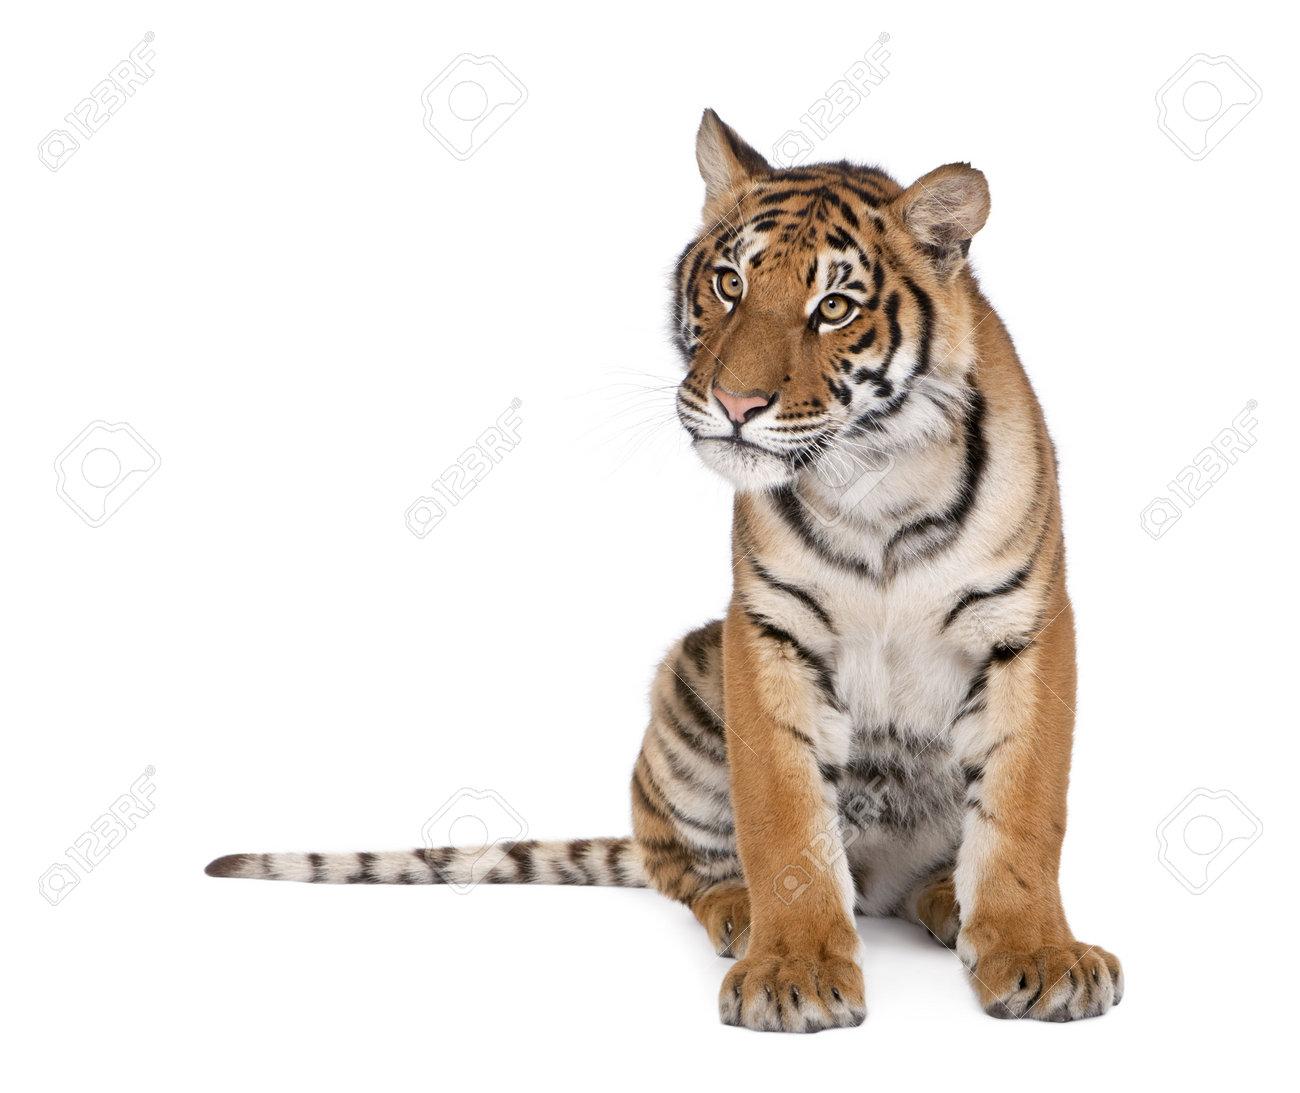 Portrait of Bengal Tiger, Panthera tigris tigris, 1 year old, sitting in front of white background, studio shot Stock Photo - 5570156